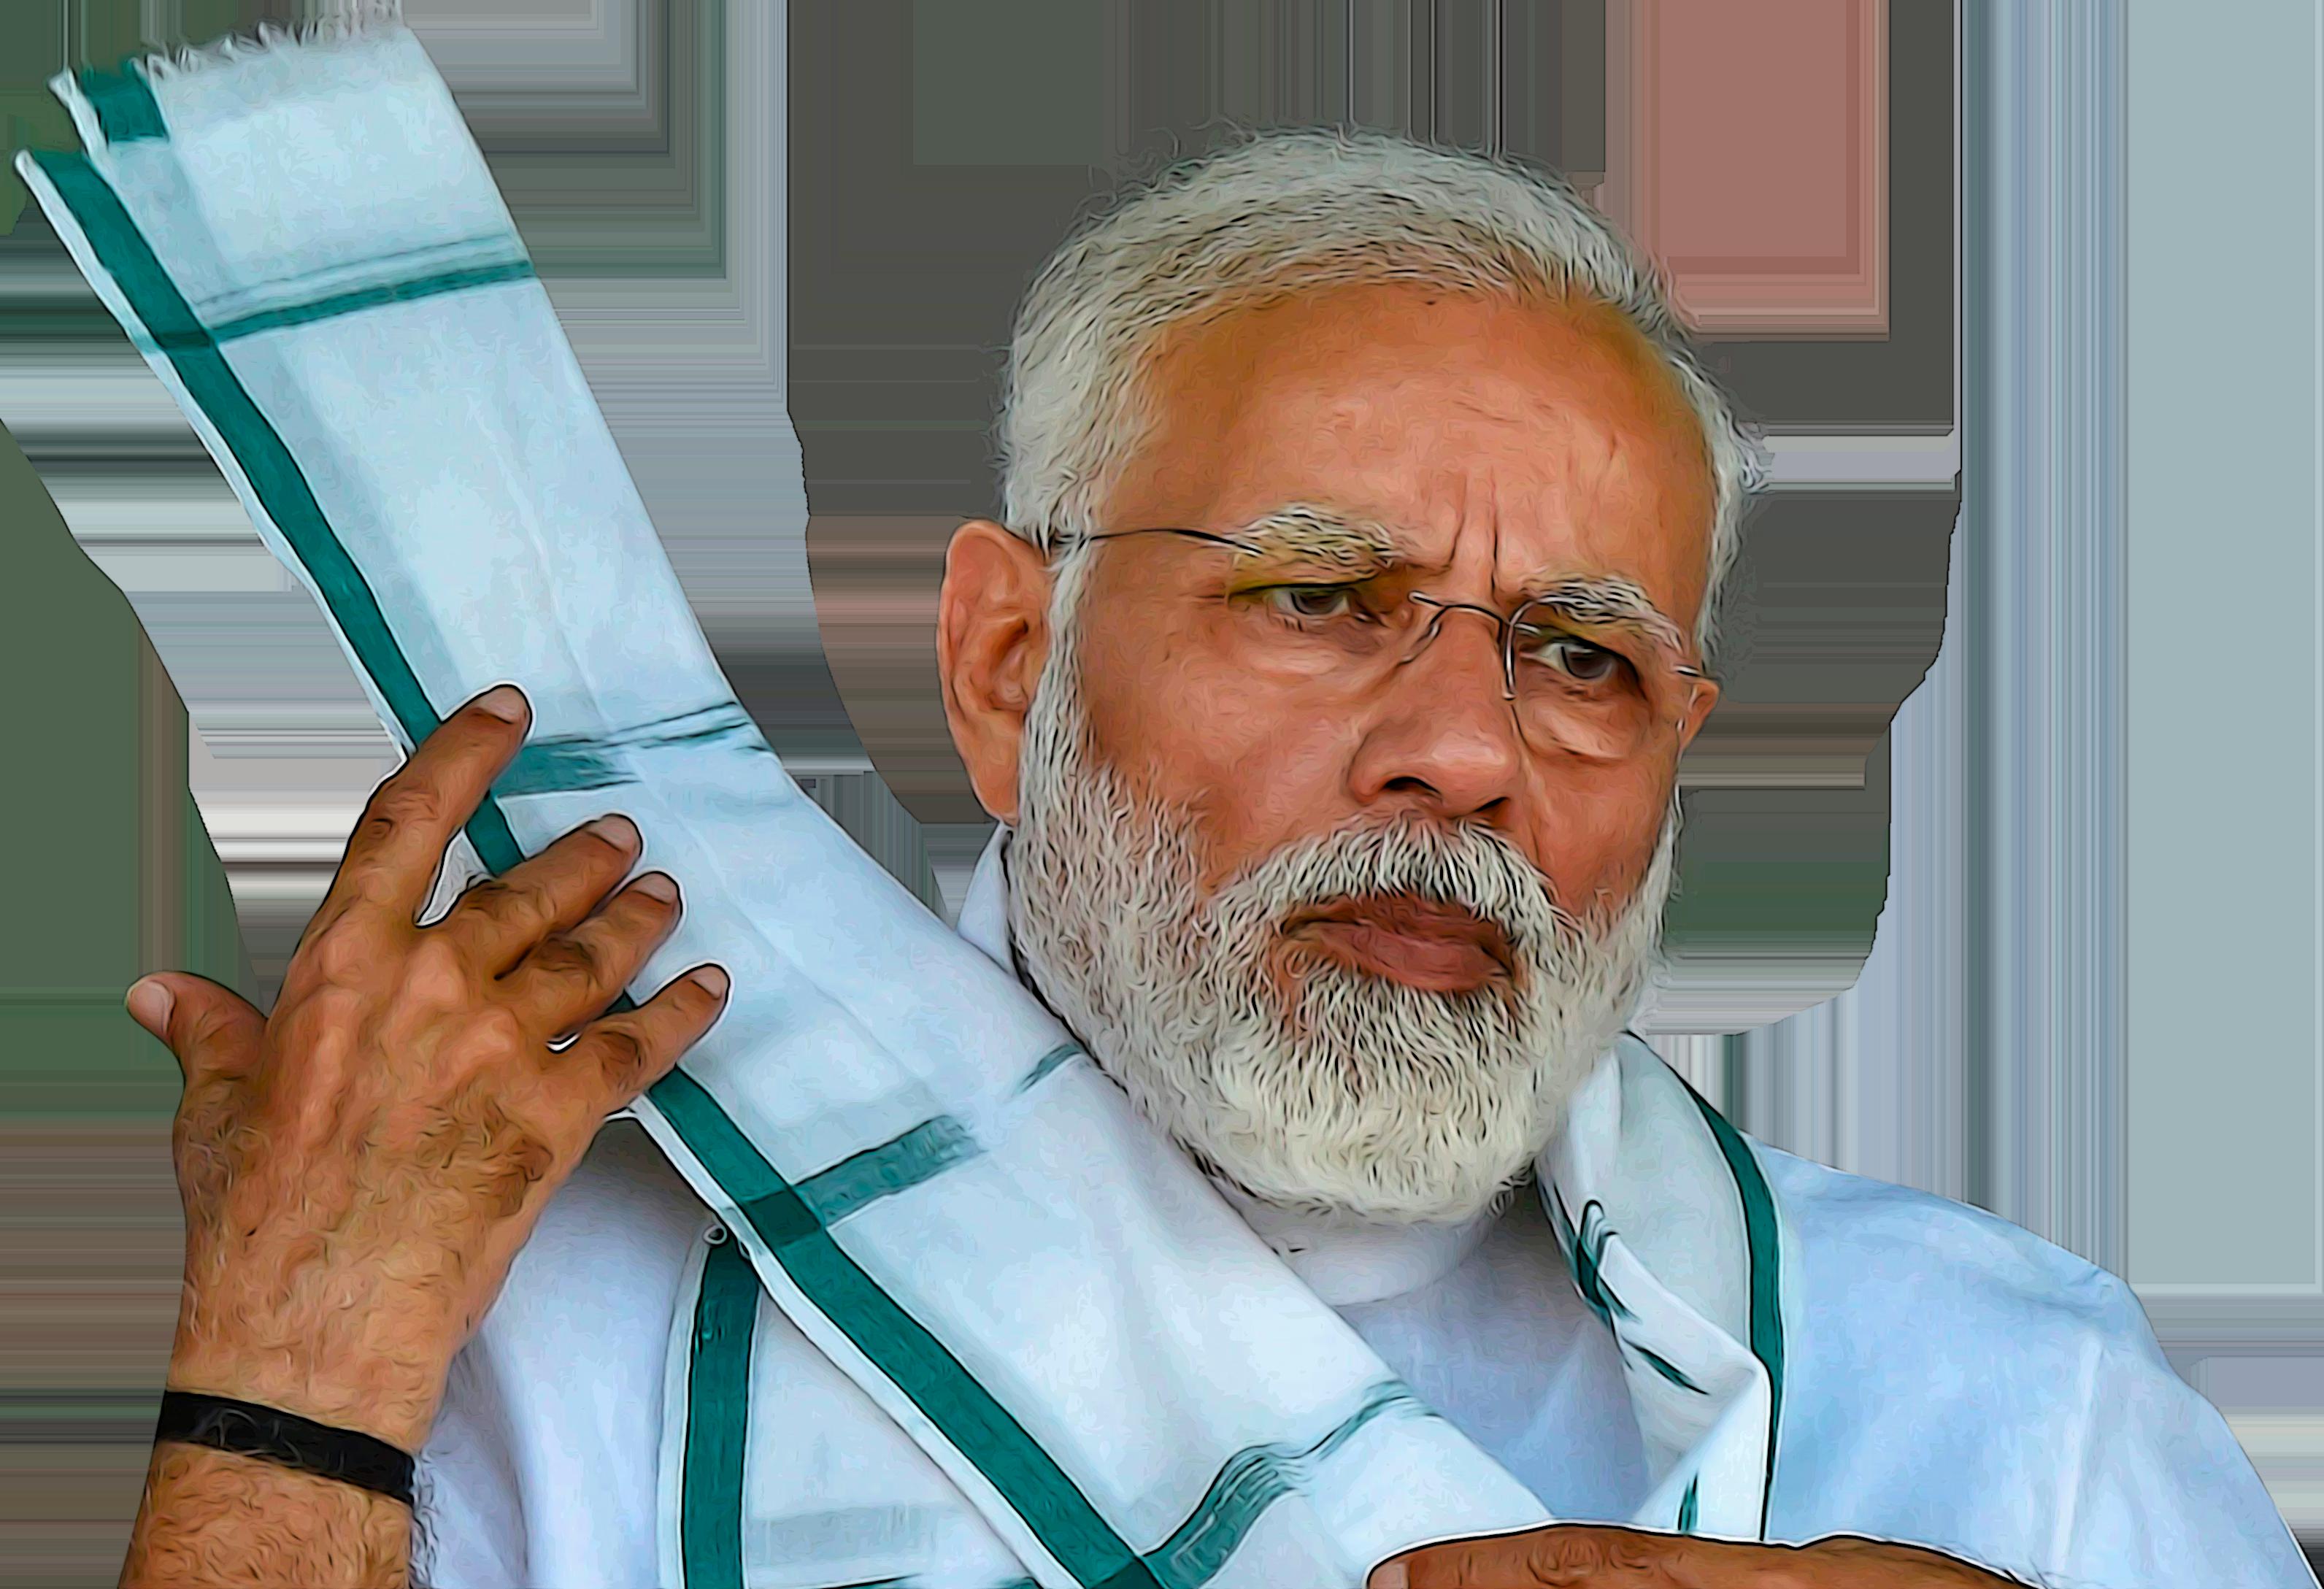 Modi Action Rajnikant Okay Gesture Cutout Thumbs Up